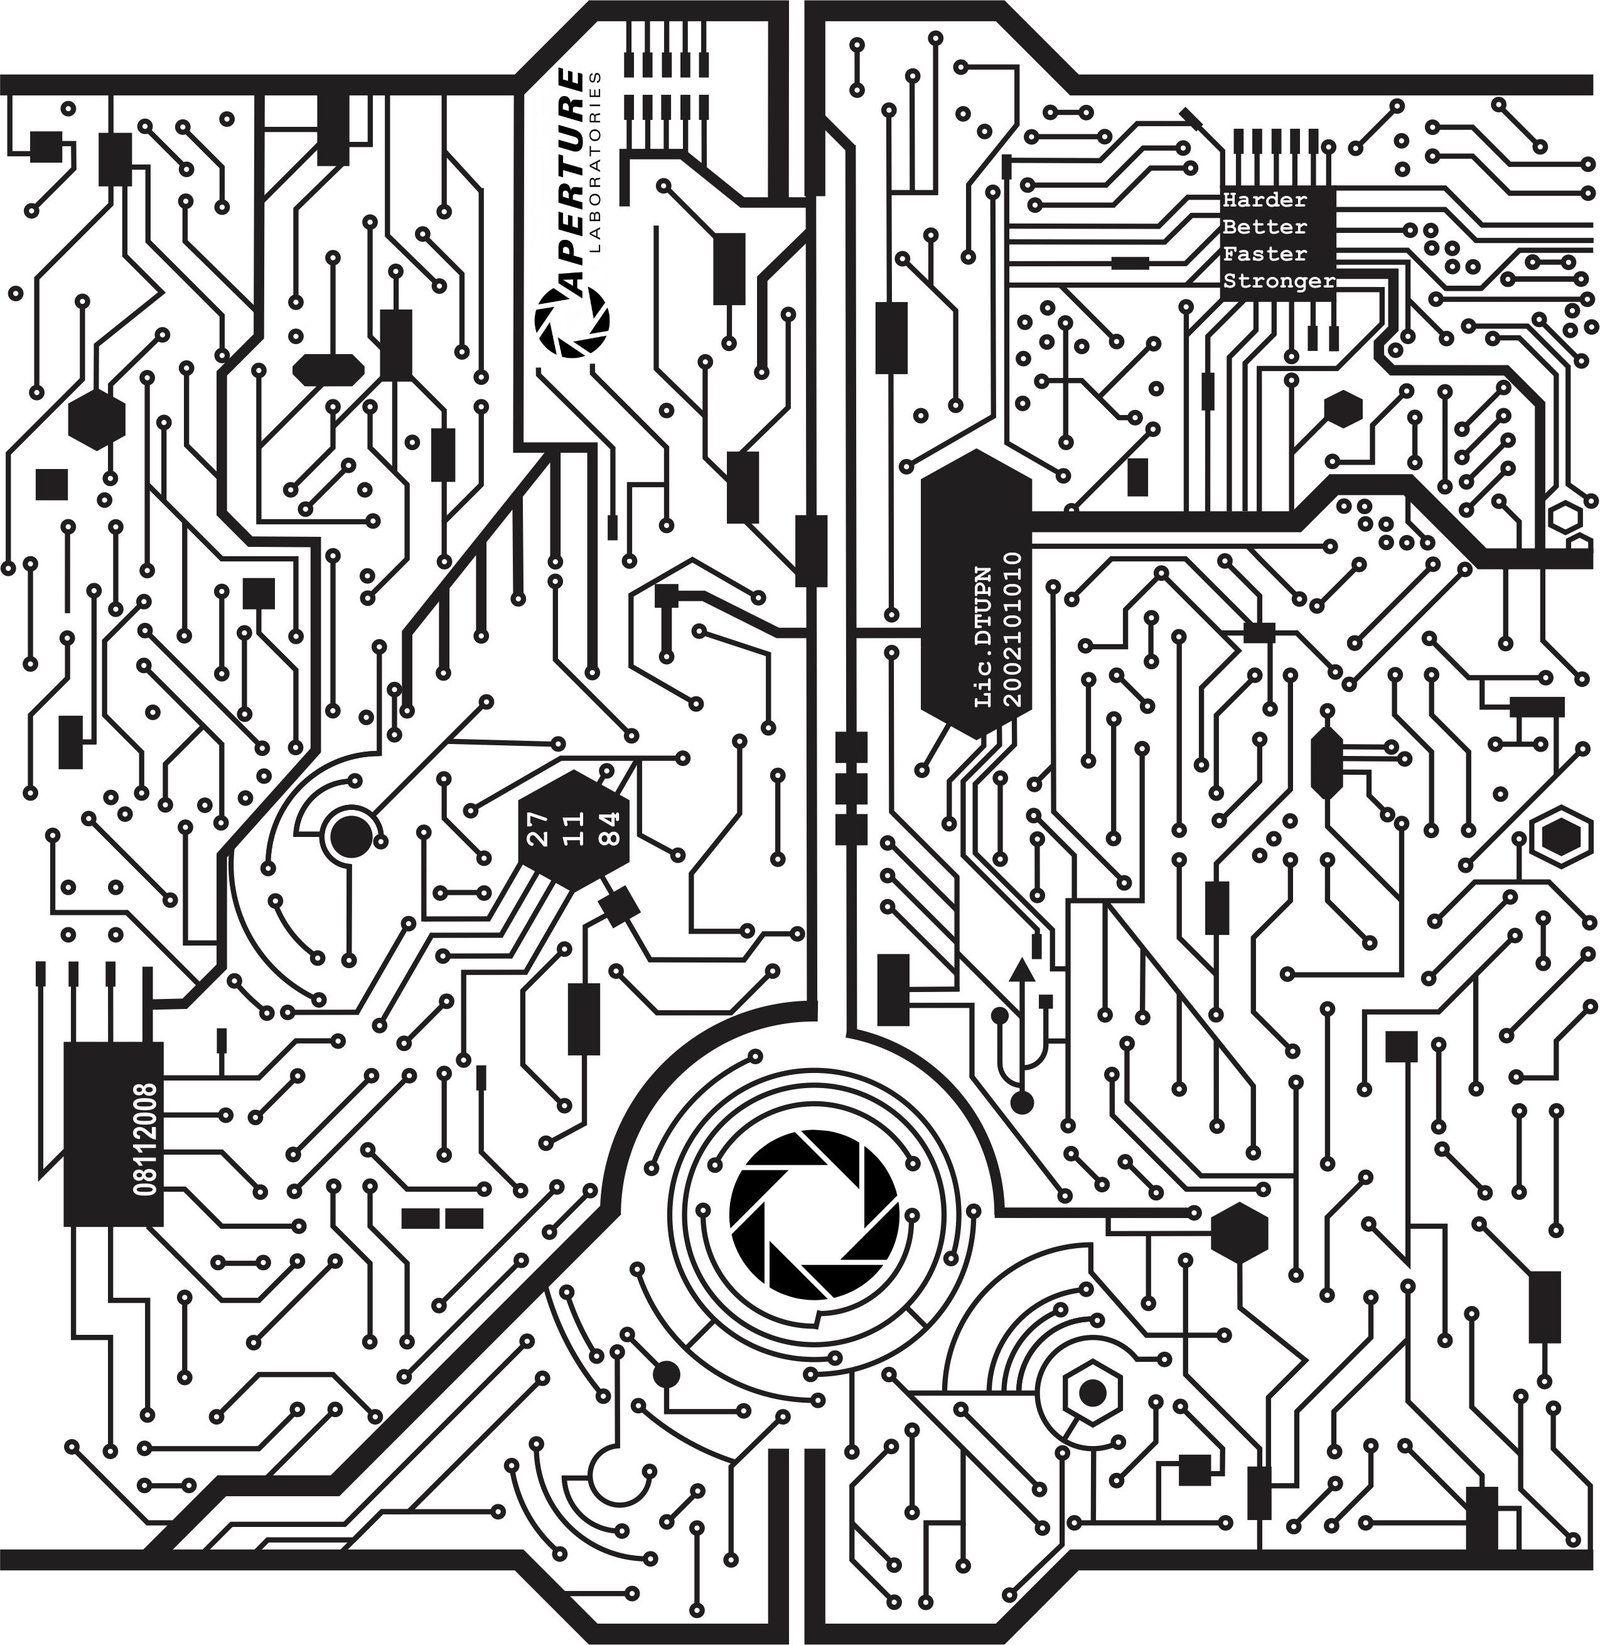 Circuit Tattoo Sketch By Kmykse84viantart On